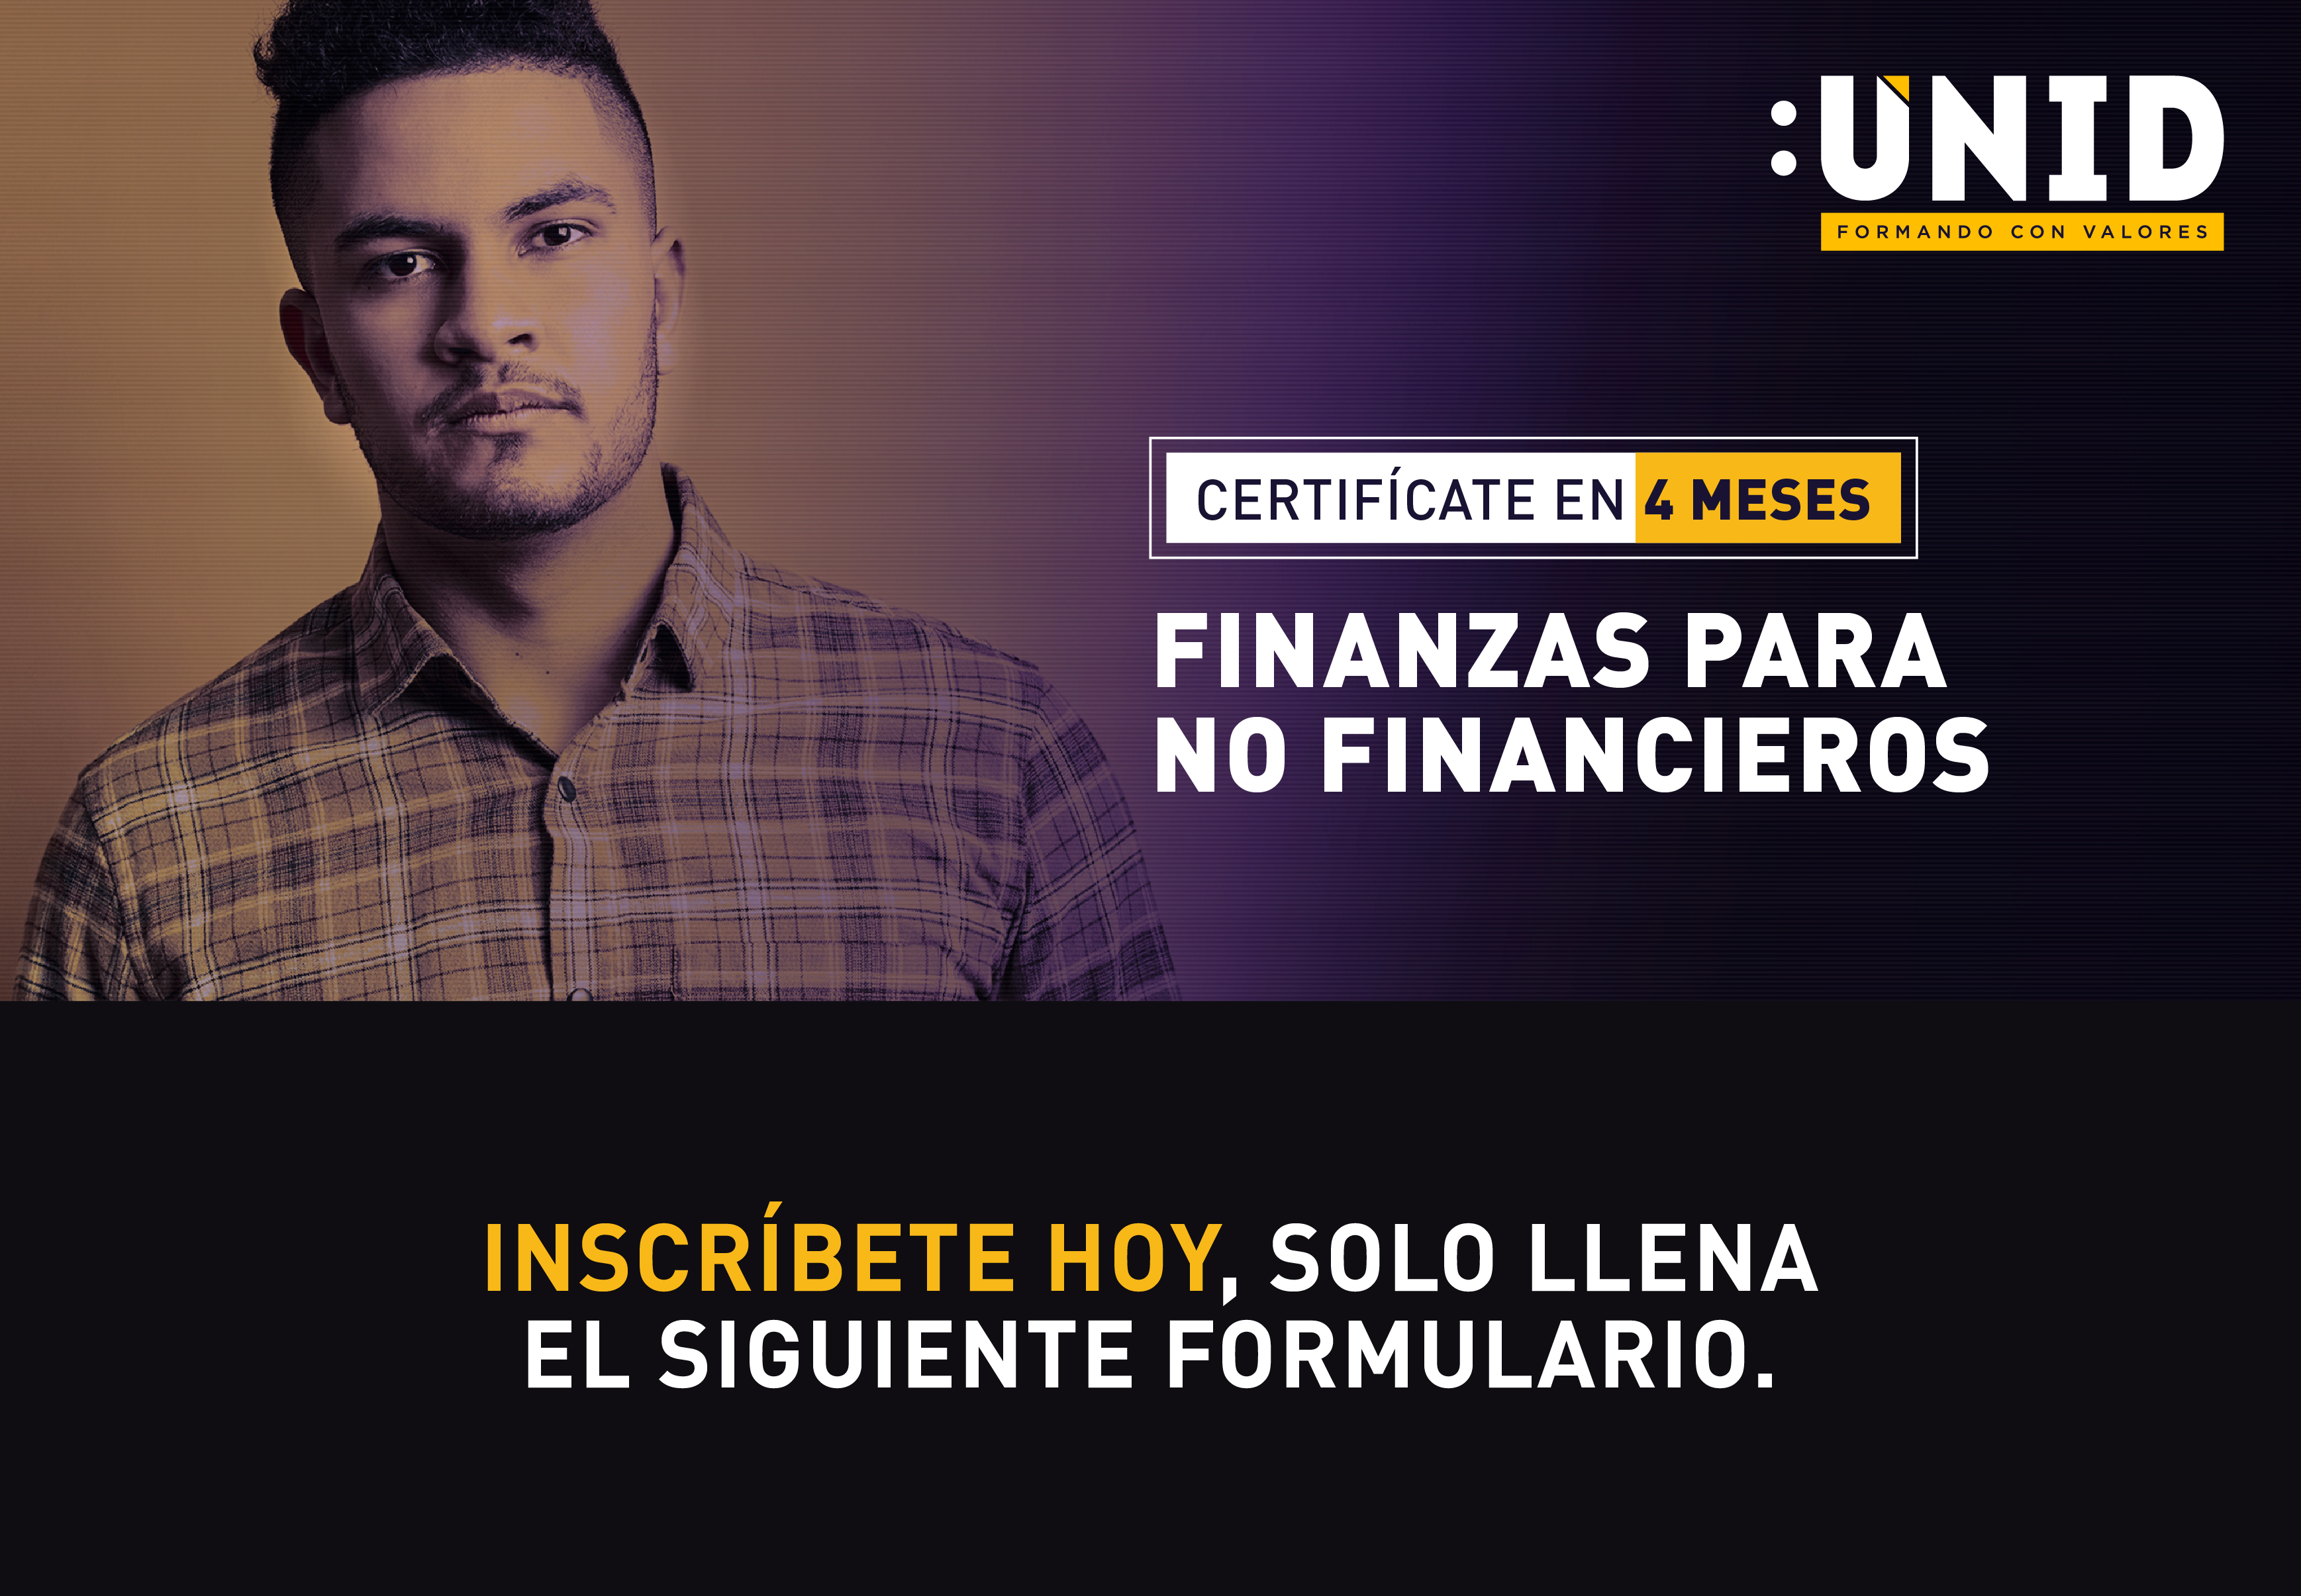 UNID LP Finanzas C_LANDING 1